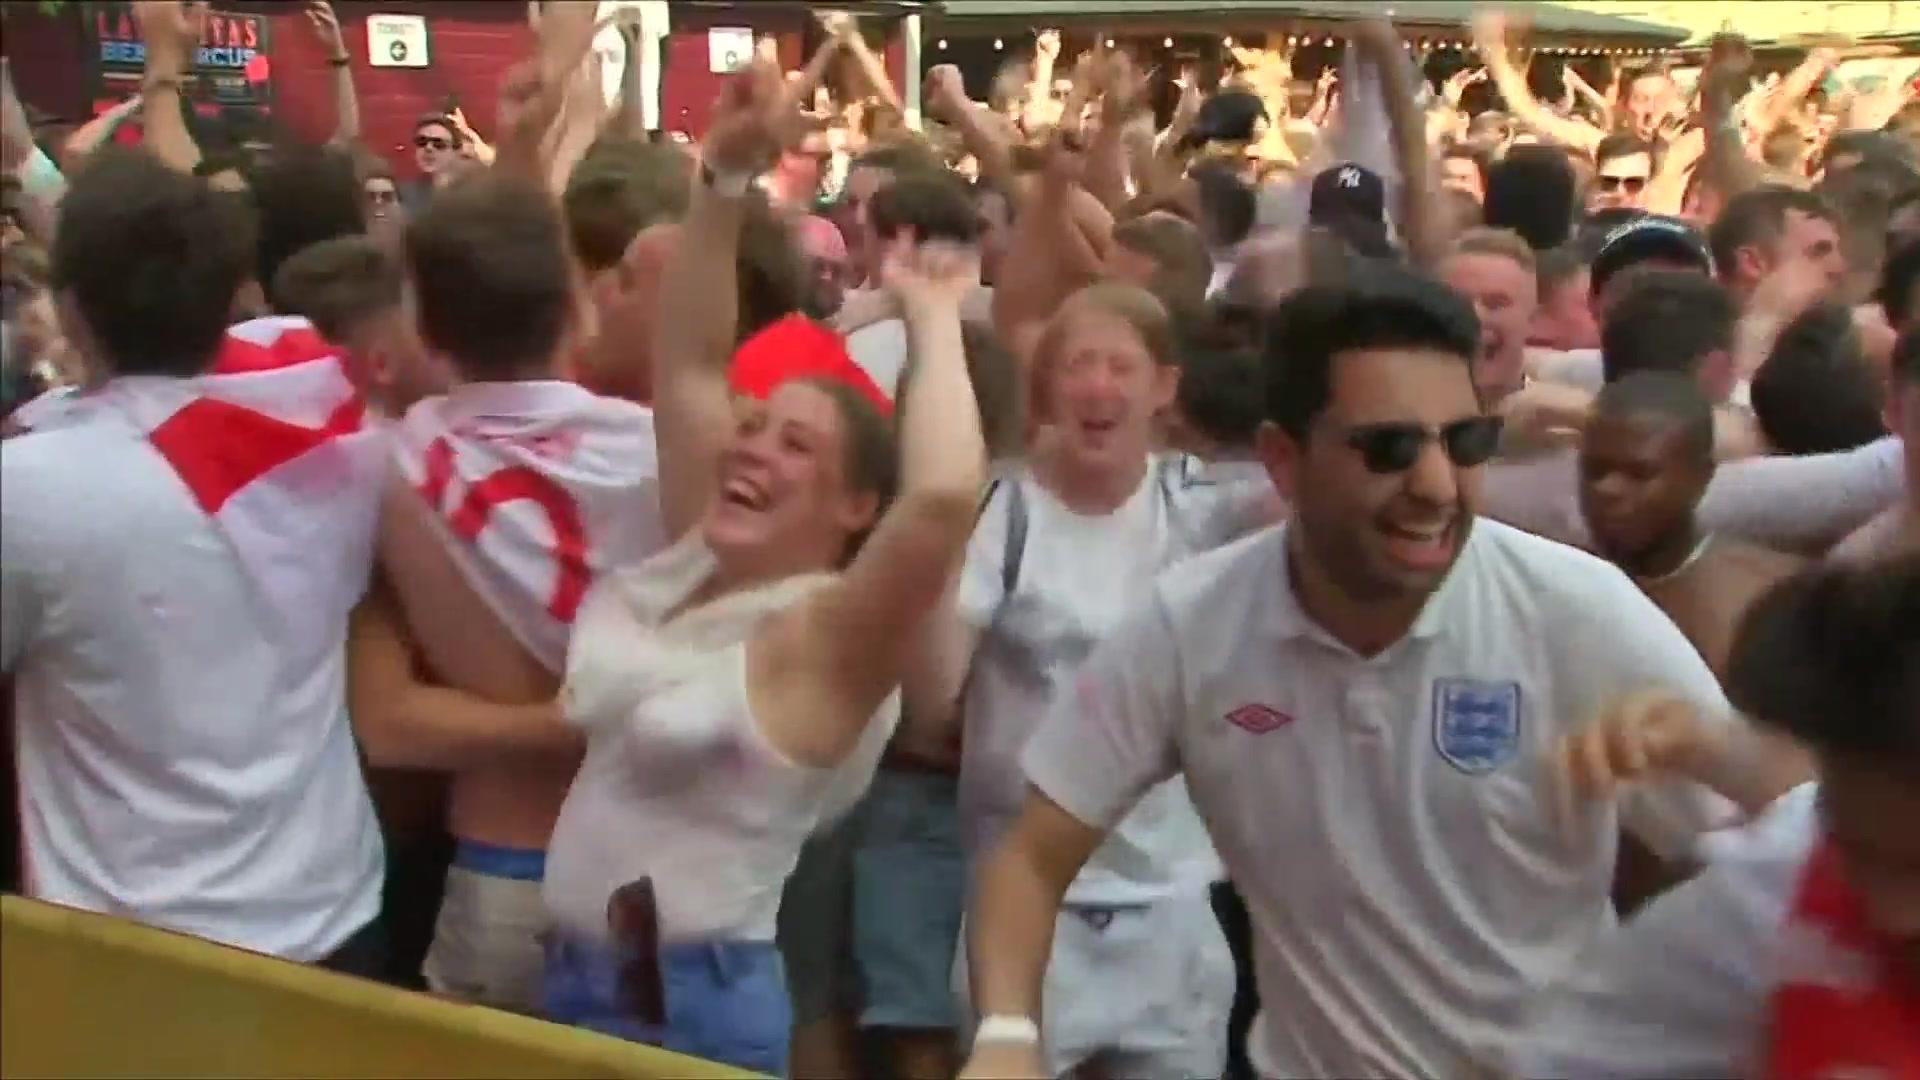 England fan throwing freshly poured pints